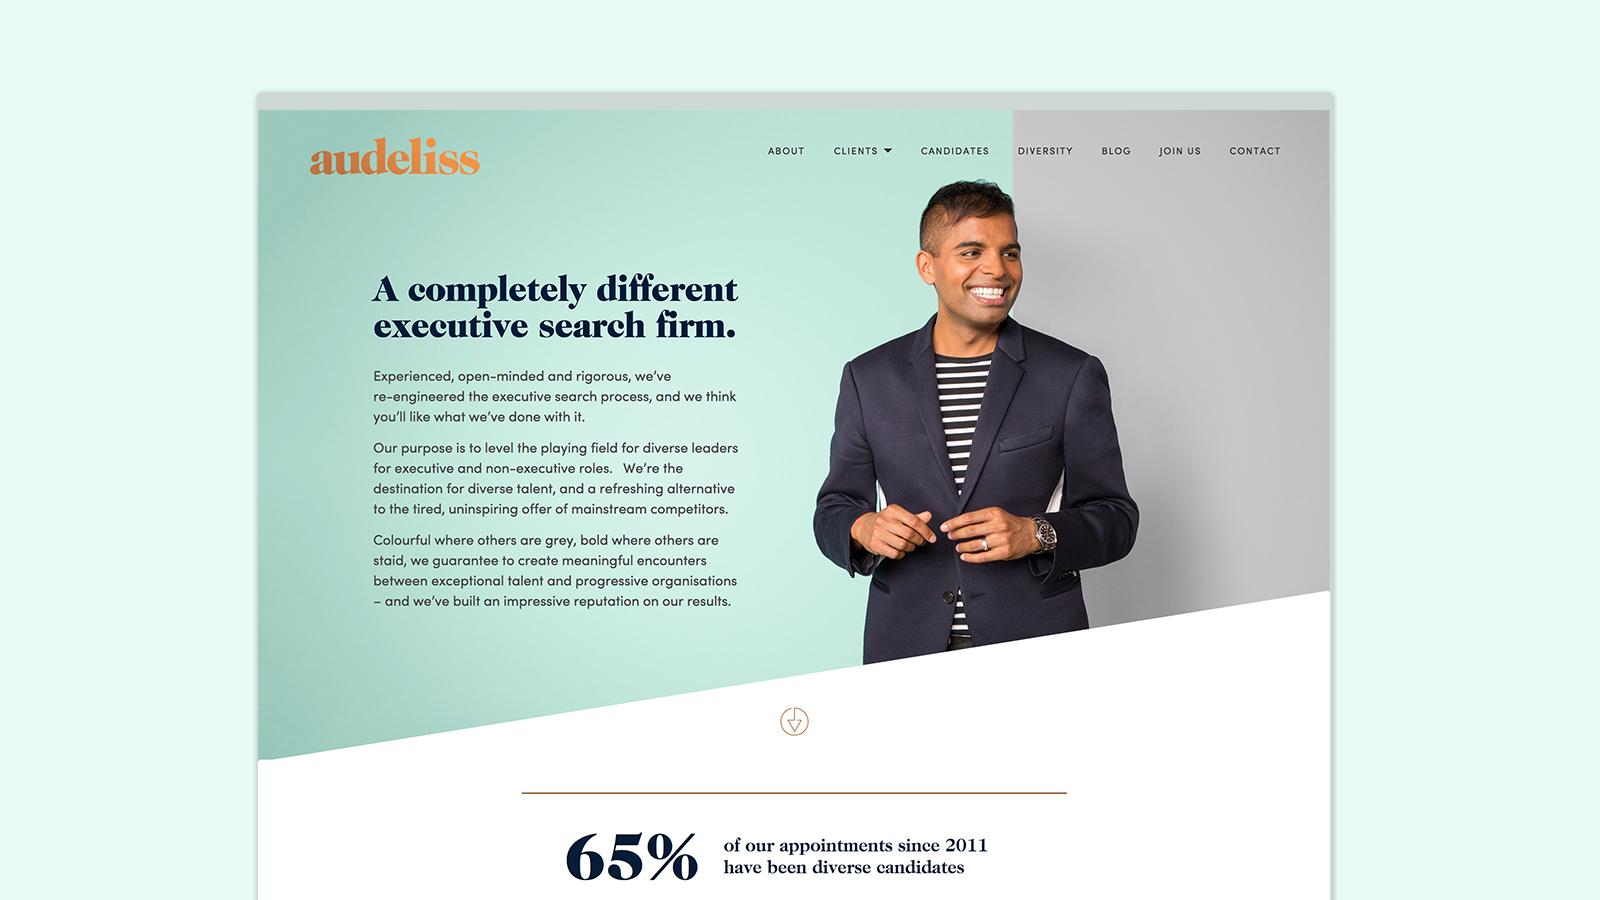 audeliss-website-home-02